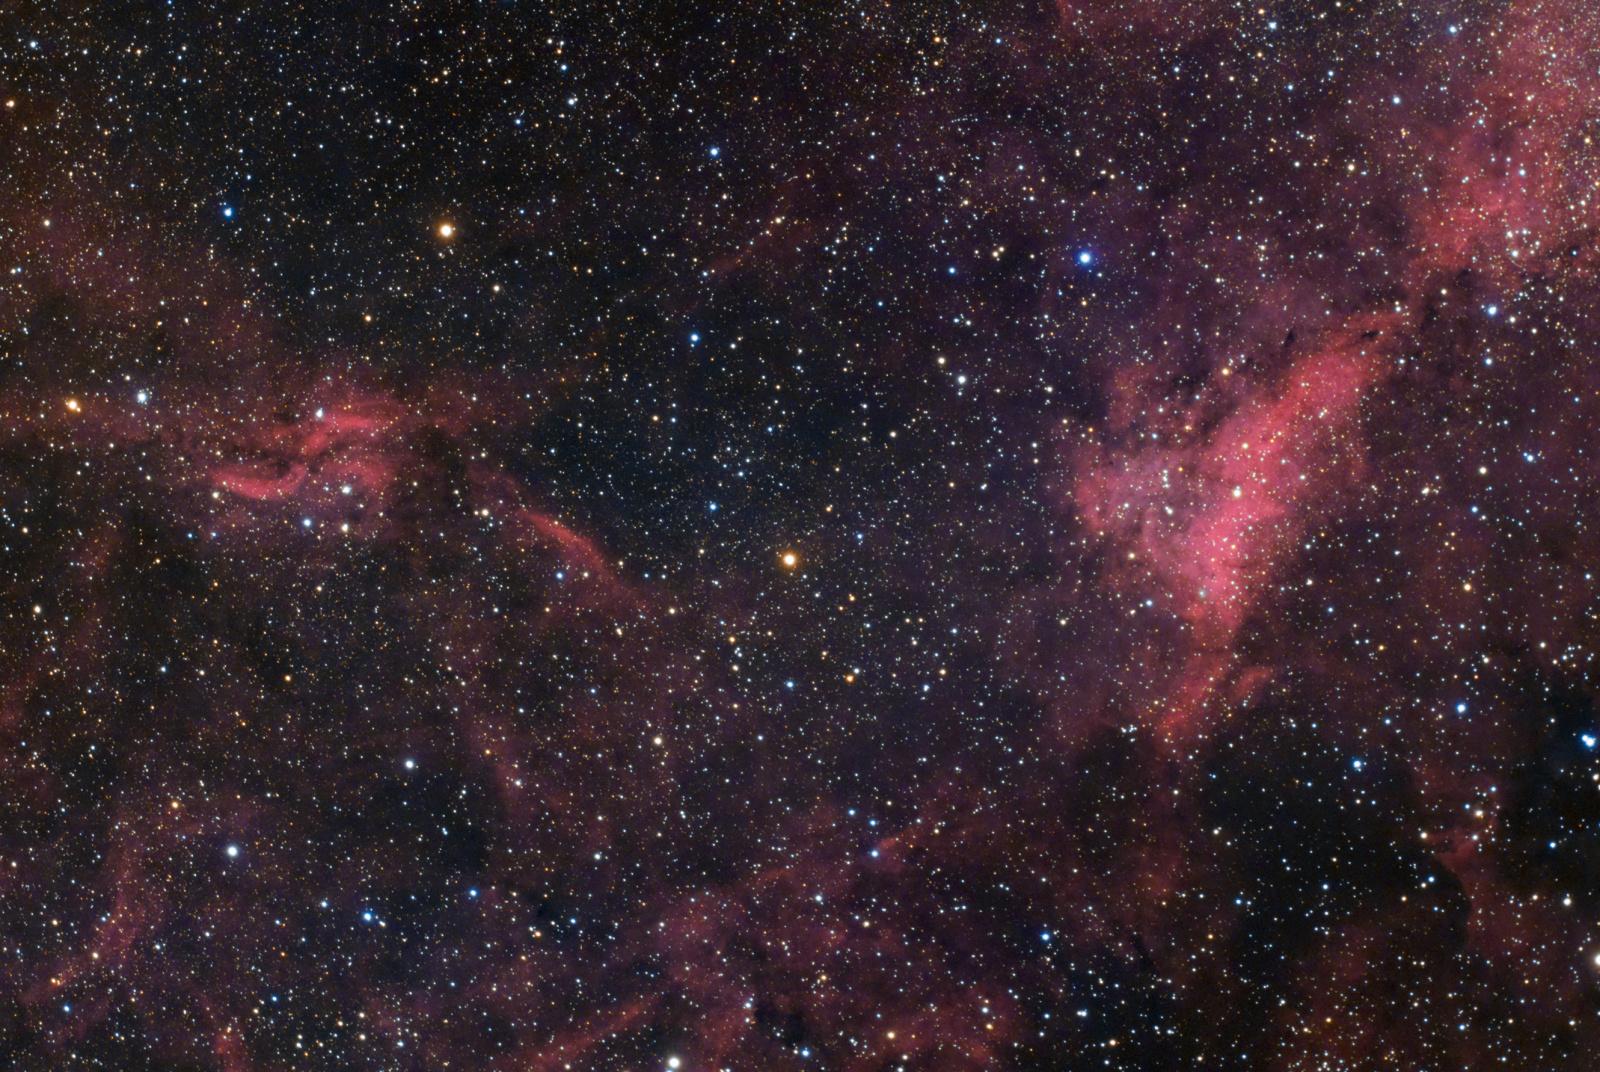 IC1318A-New-HaRGB.thumb.jpg.f02717f0e4243c2124c2e061d620fa9a.jpg